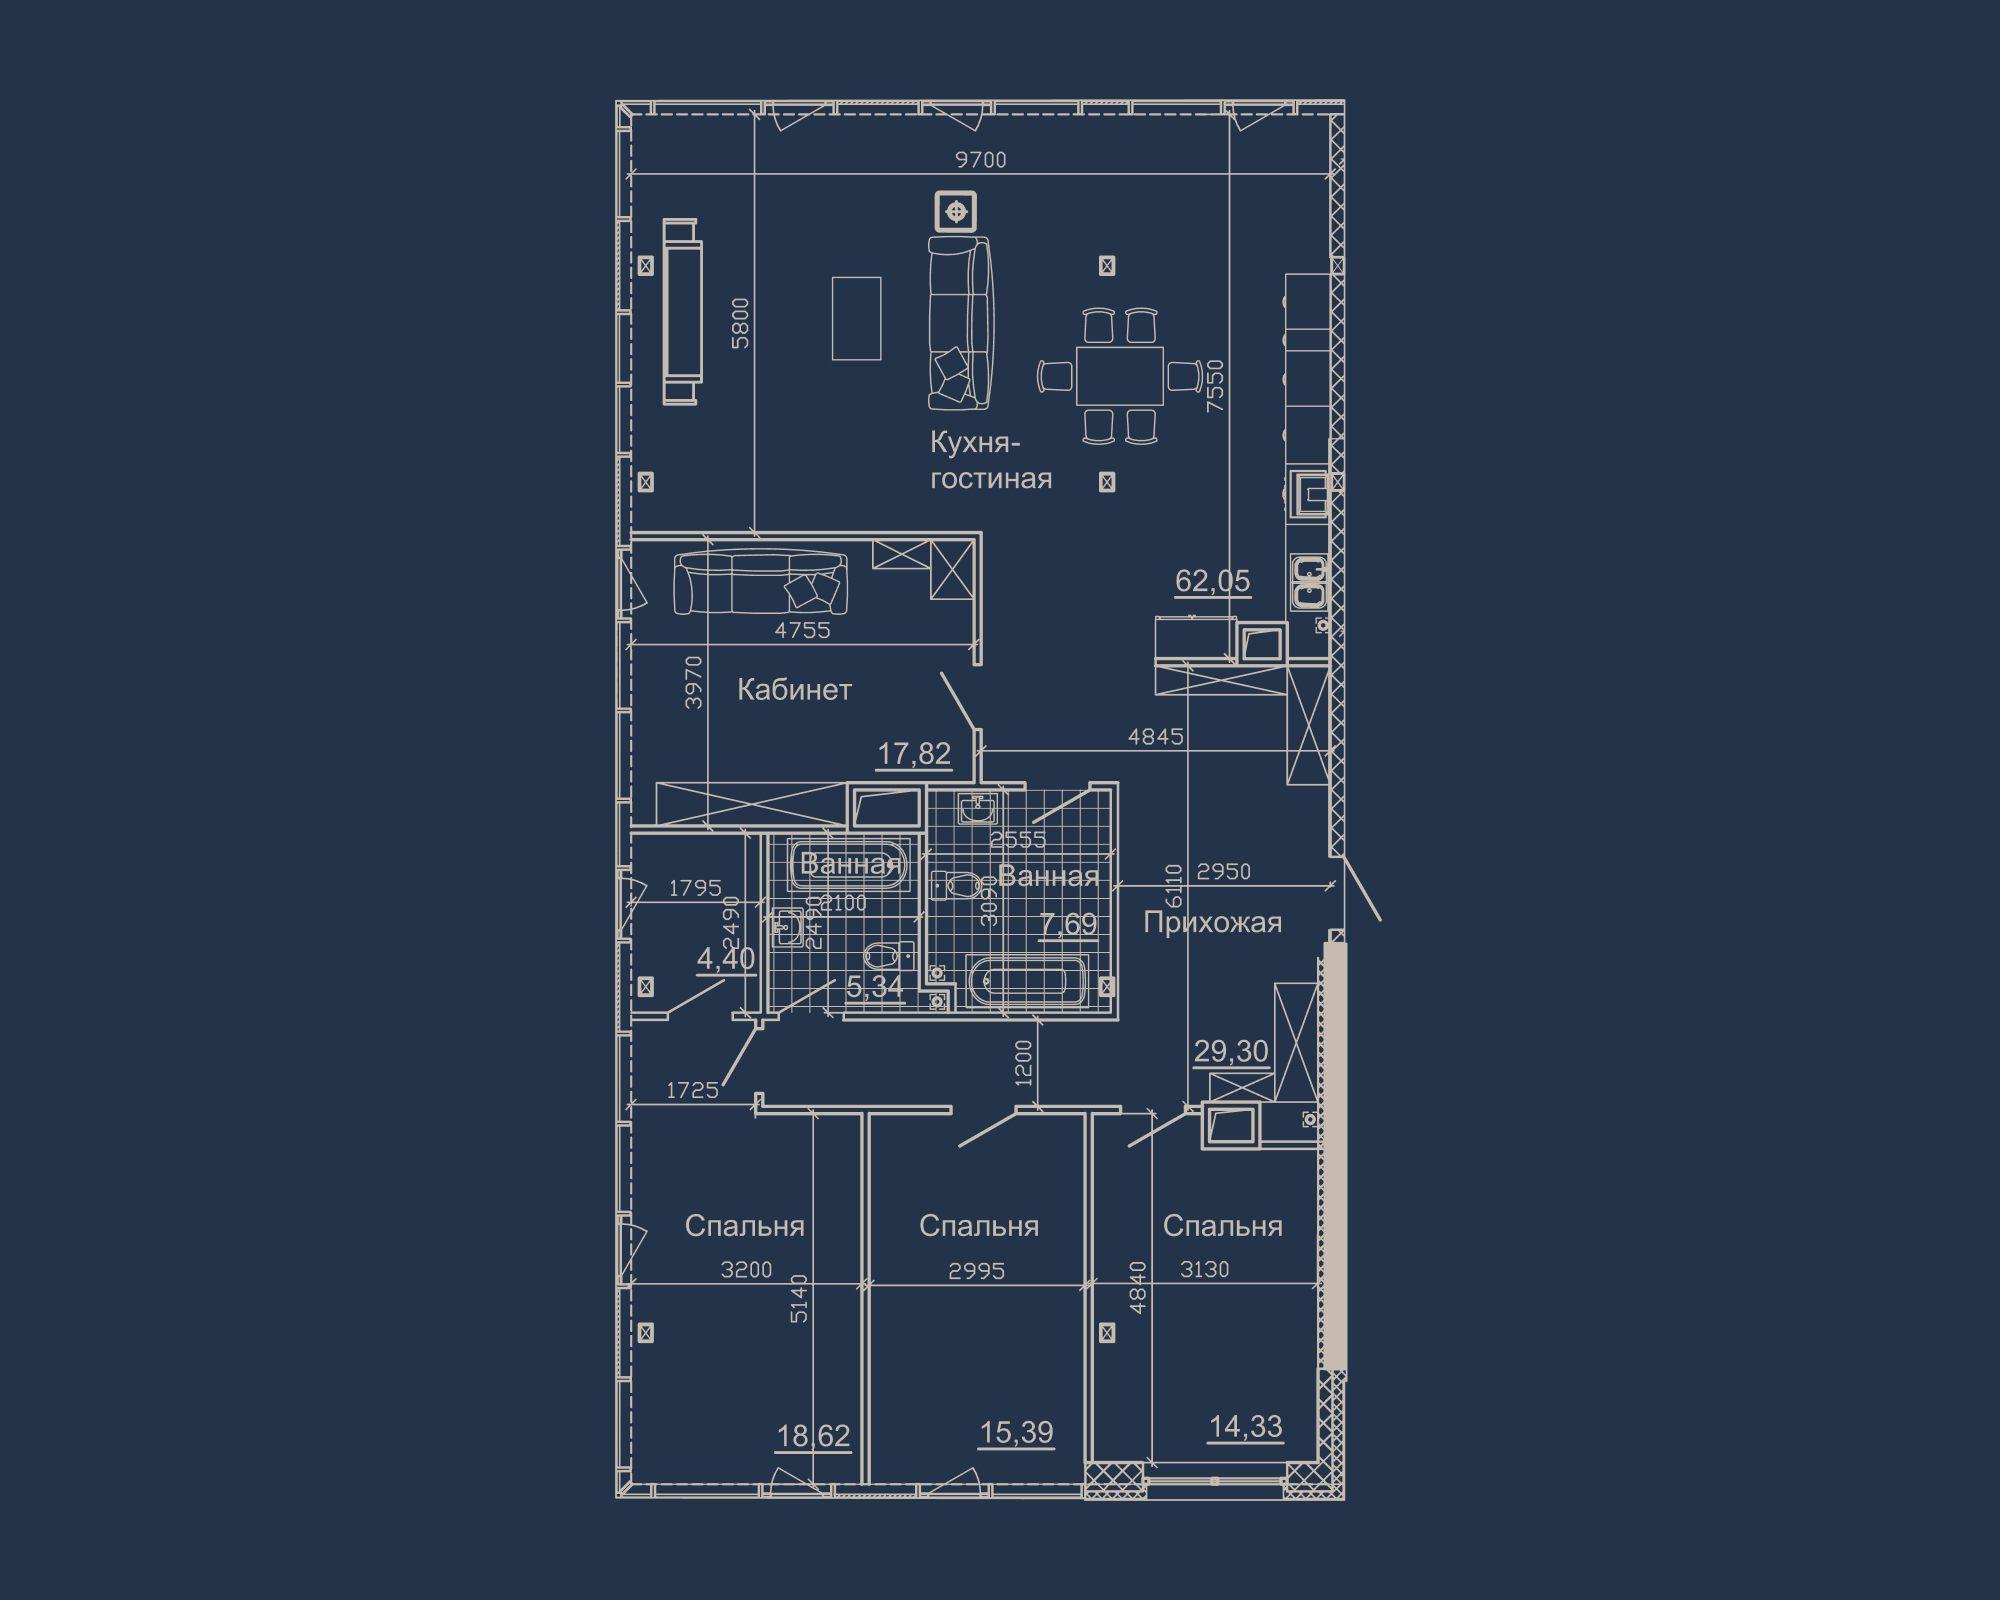 4-кімнатна квартира типу 16А у ЖК Nebo